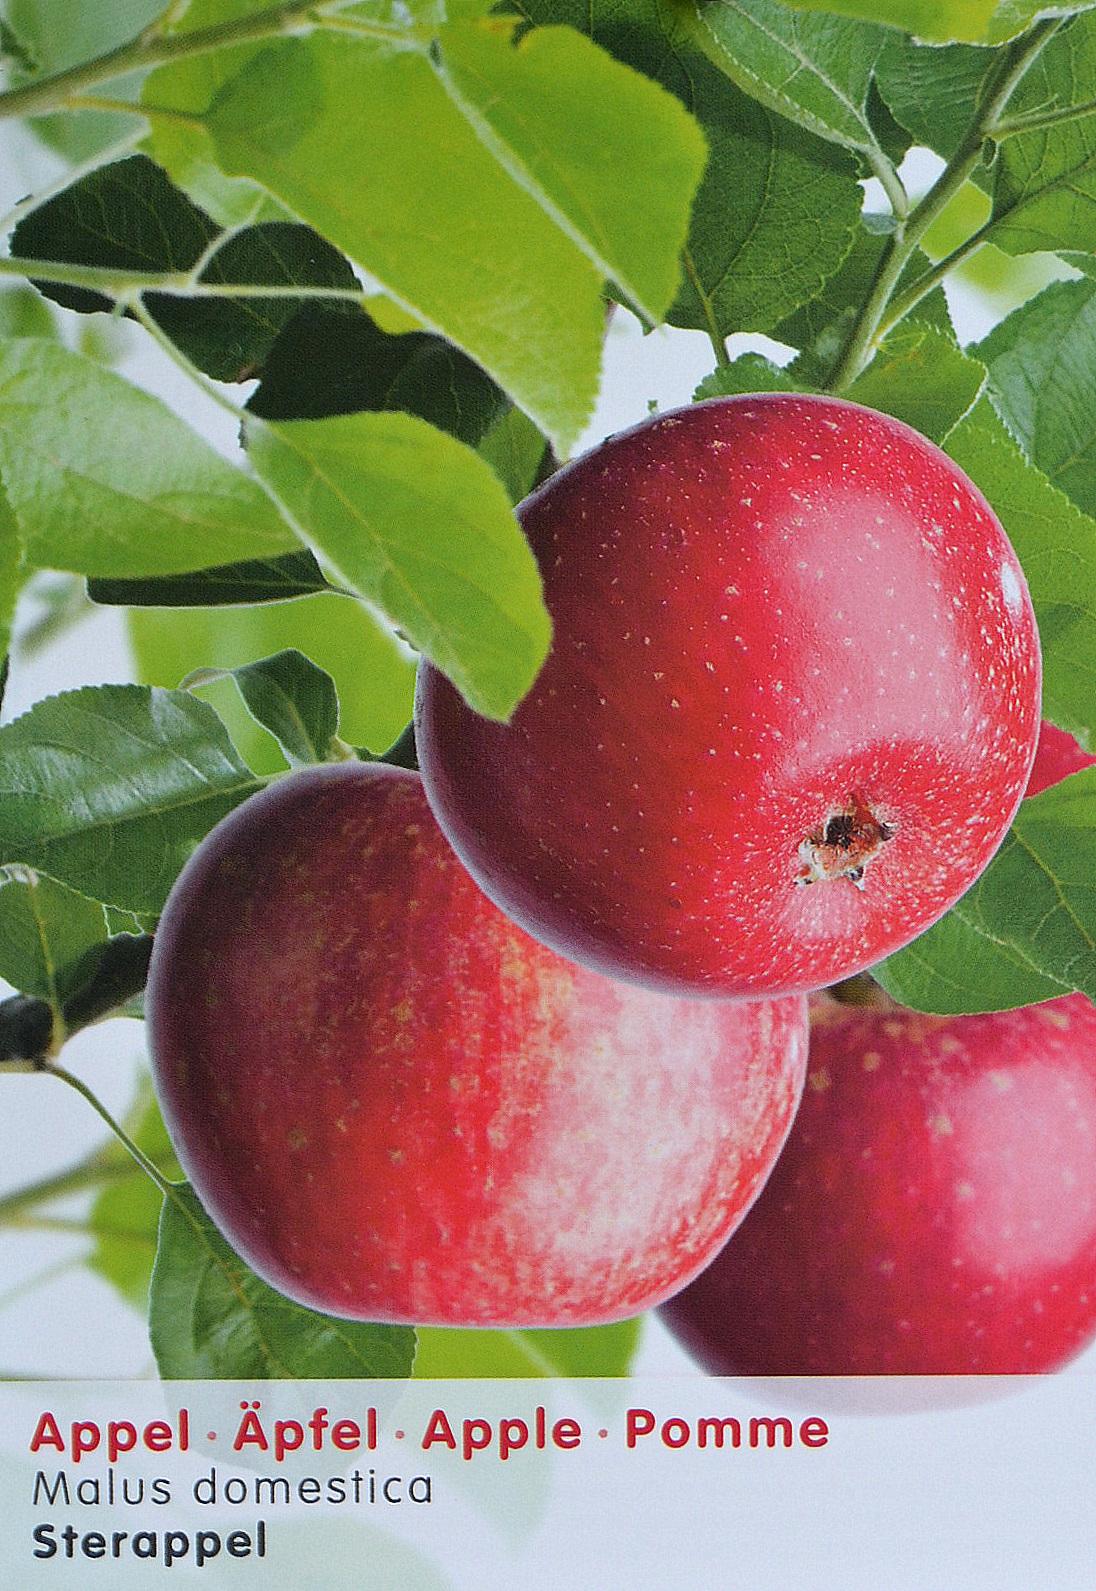 Malus 'Sterappel' fruitboom